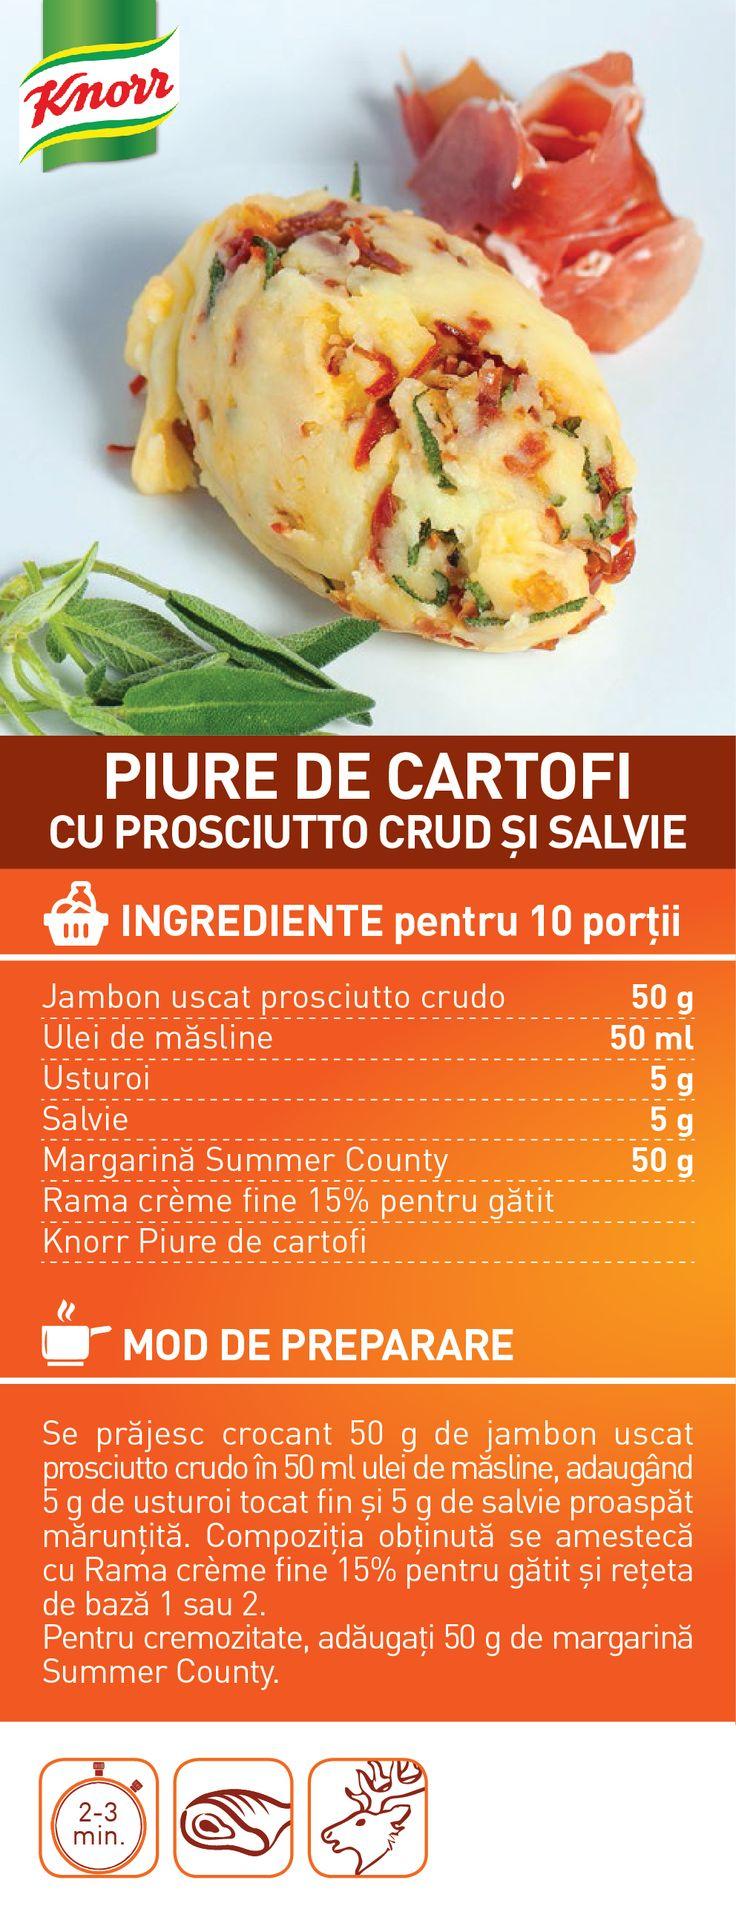 Piure de cartofi cu prosciutto crud si salvie - RETETA